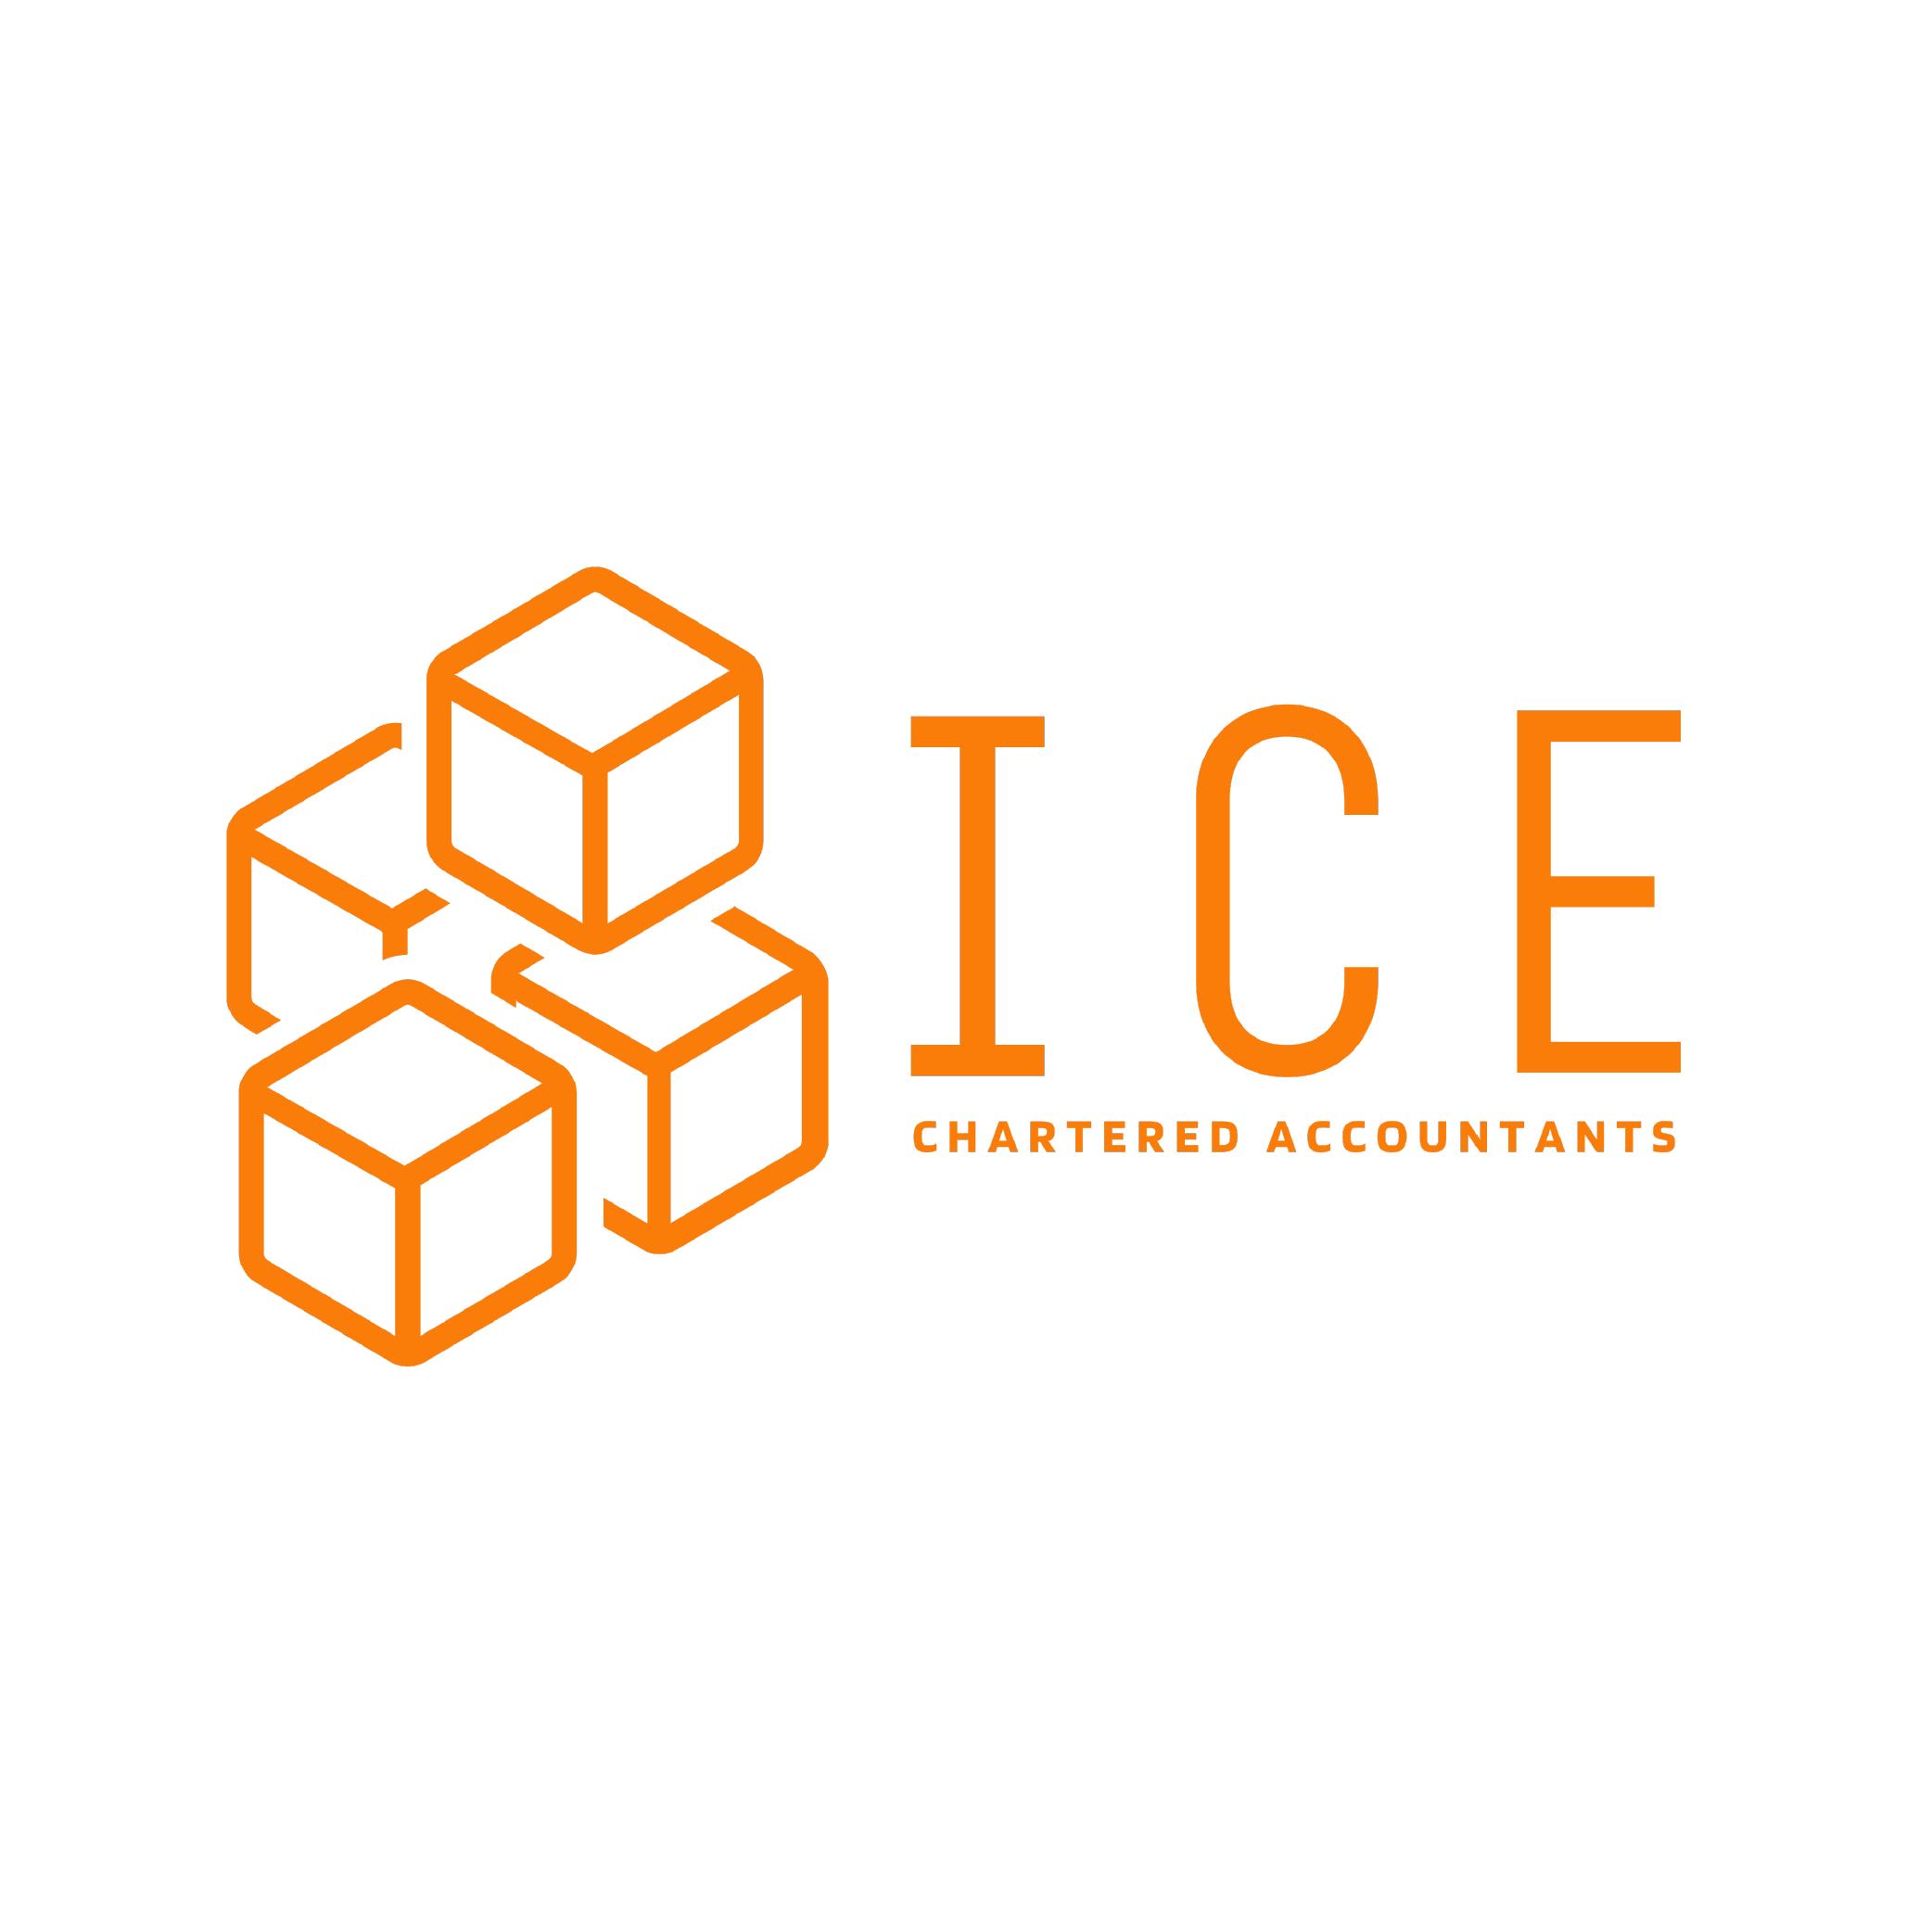 ICE PS Chartered Accountants